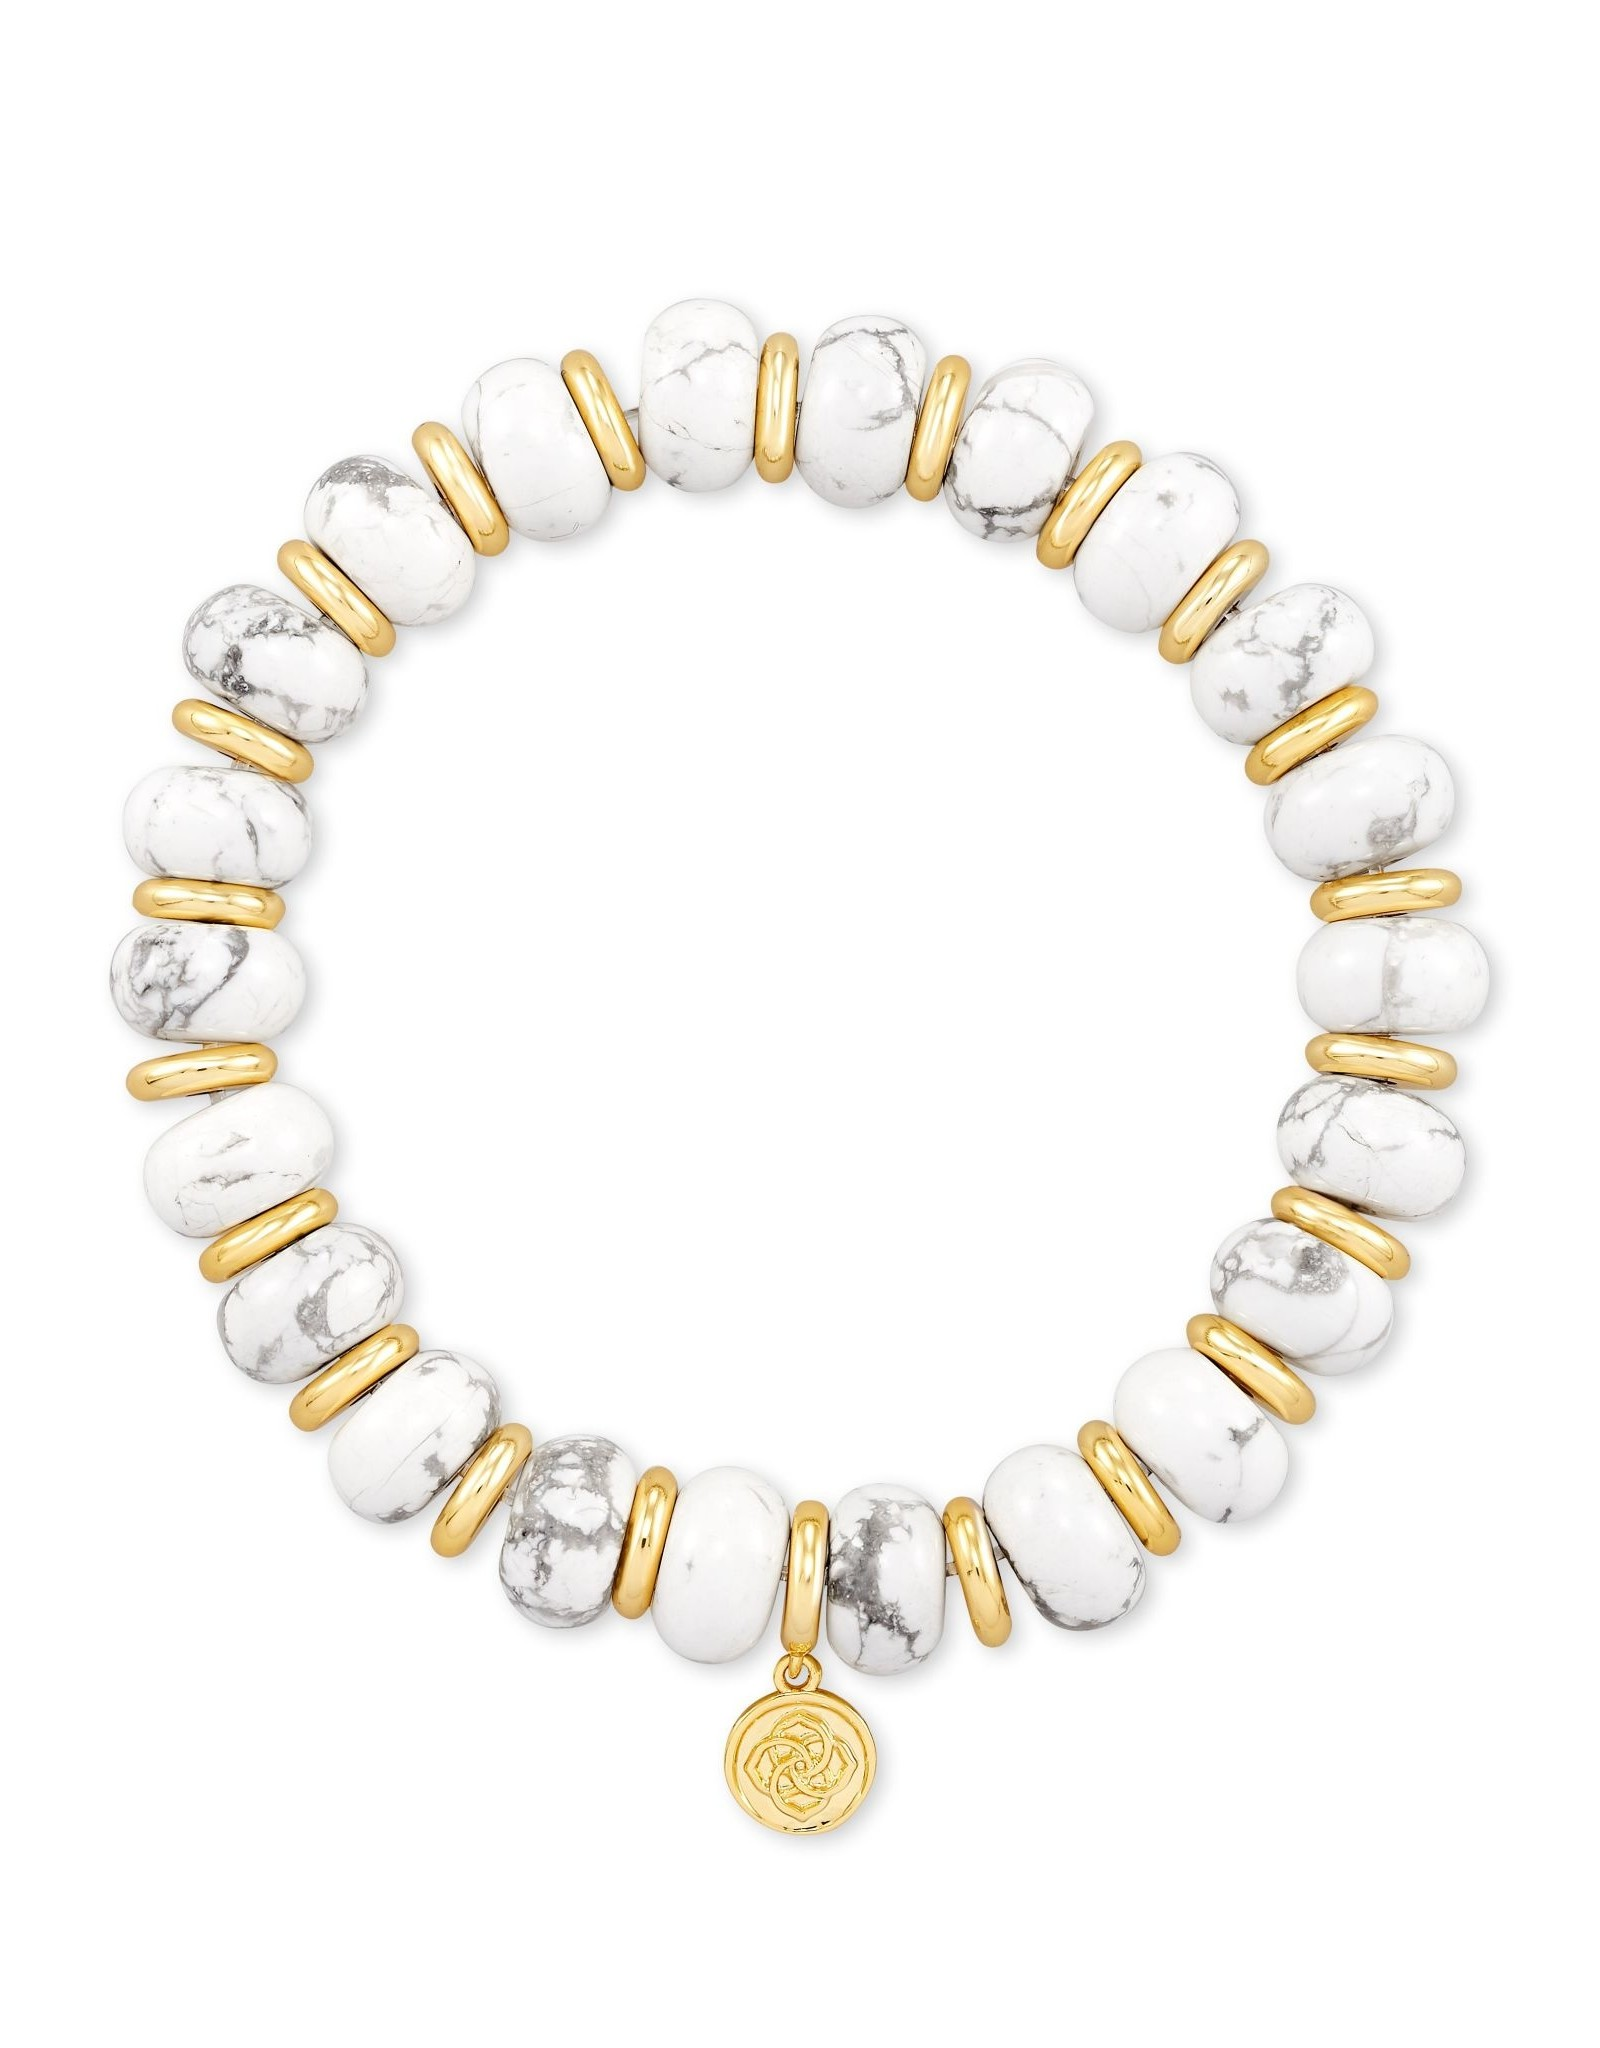 Kendra Scott Rebecca Stretch Bracelet - White Howlite/Gold